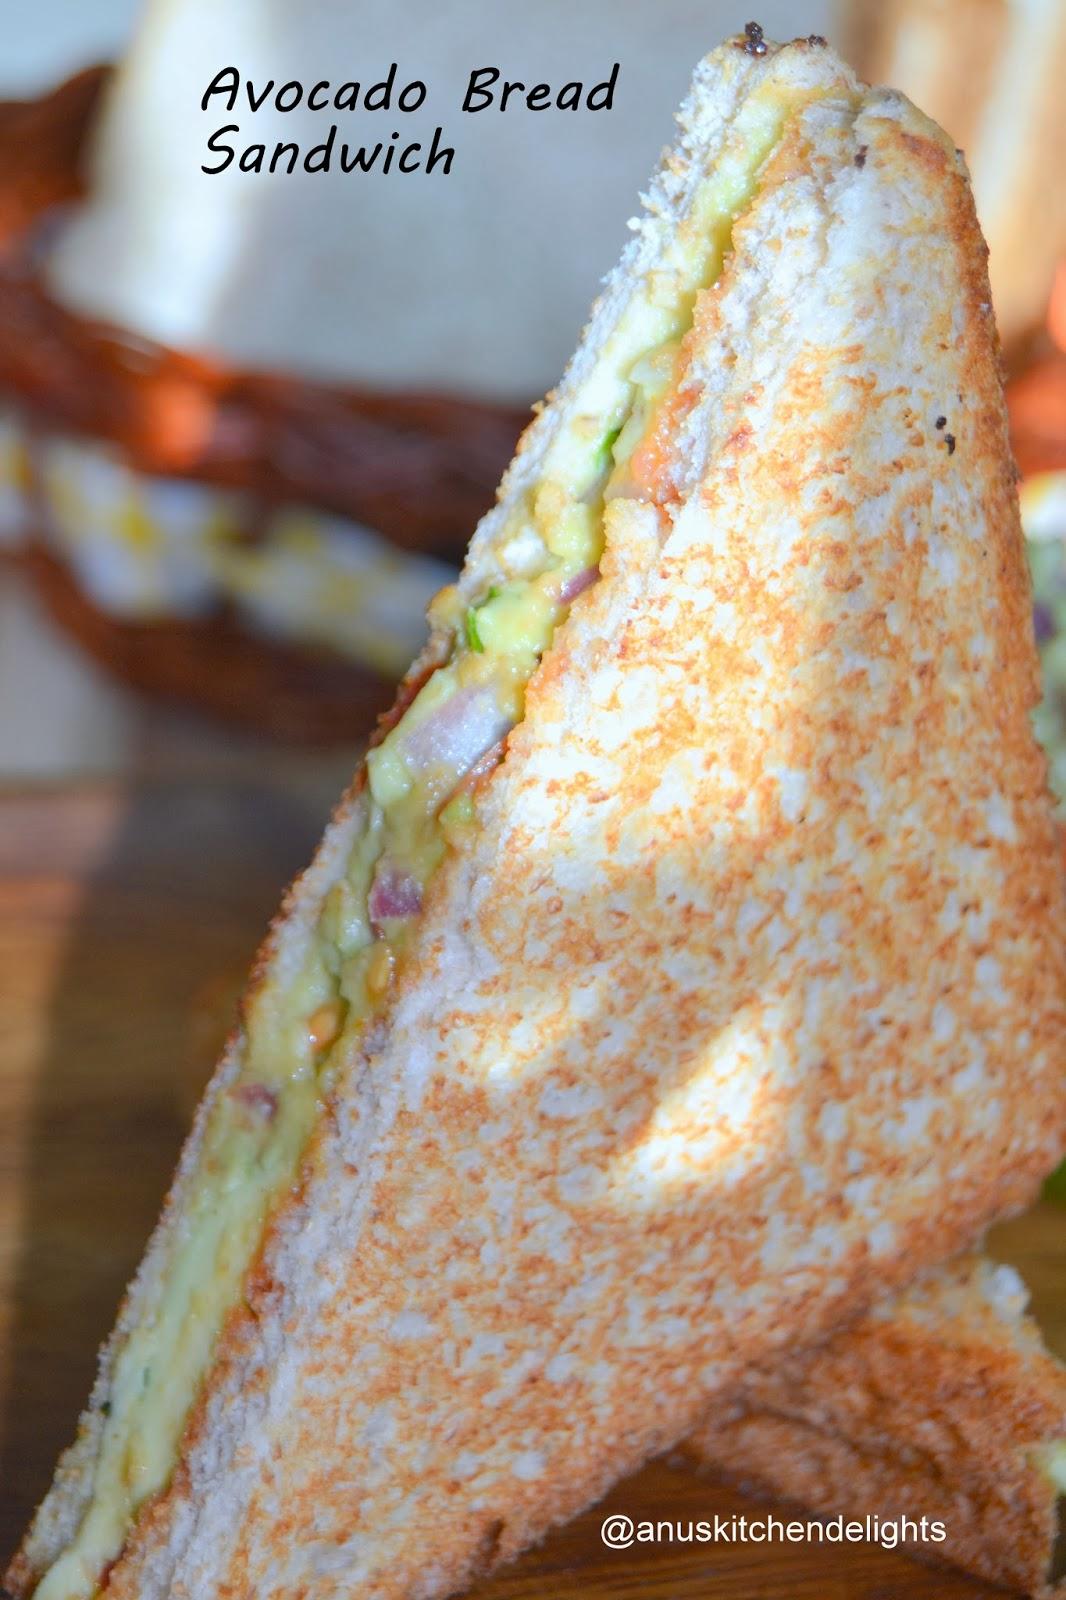 Avocado Bread Sandwich